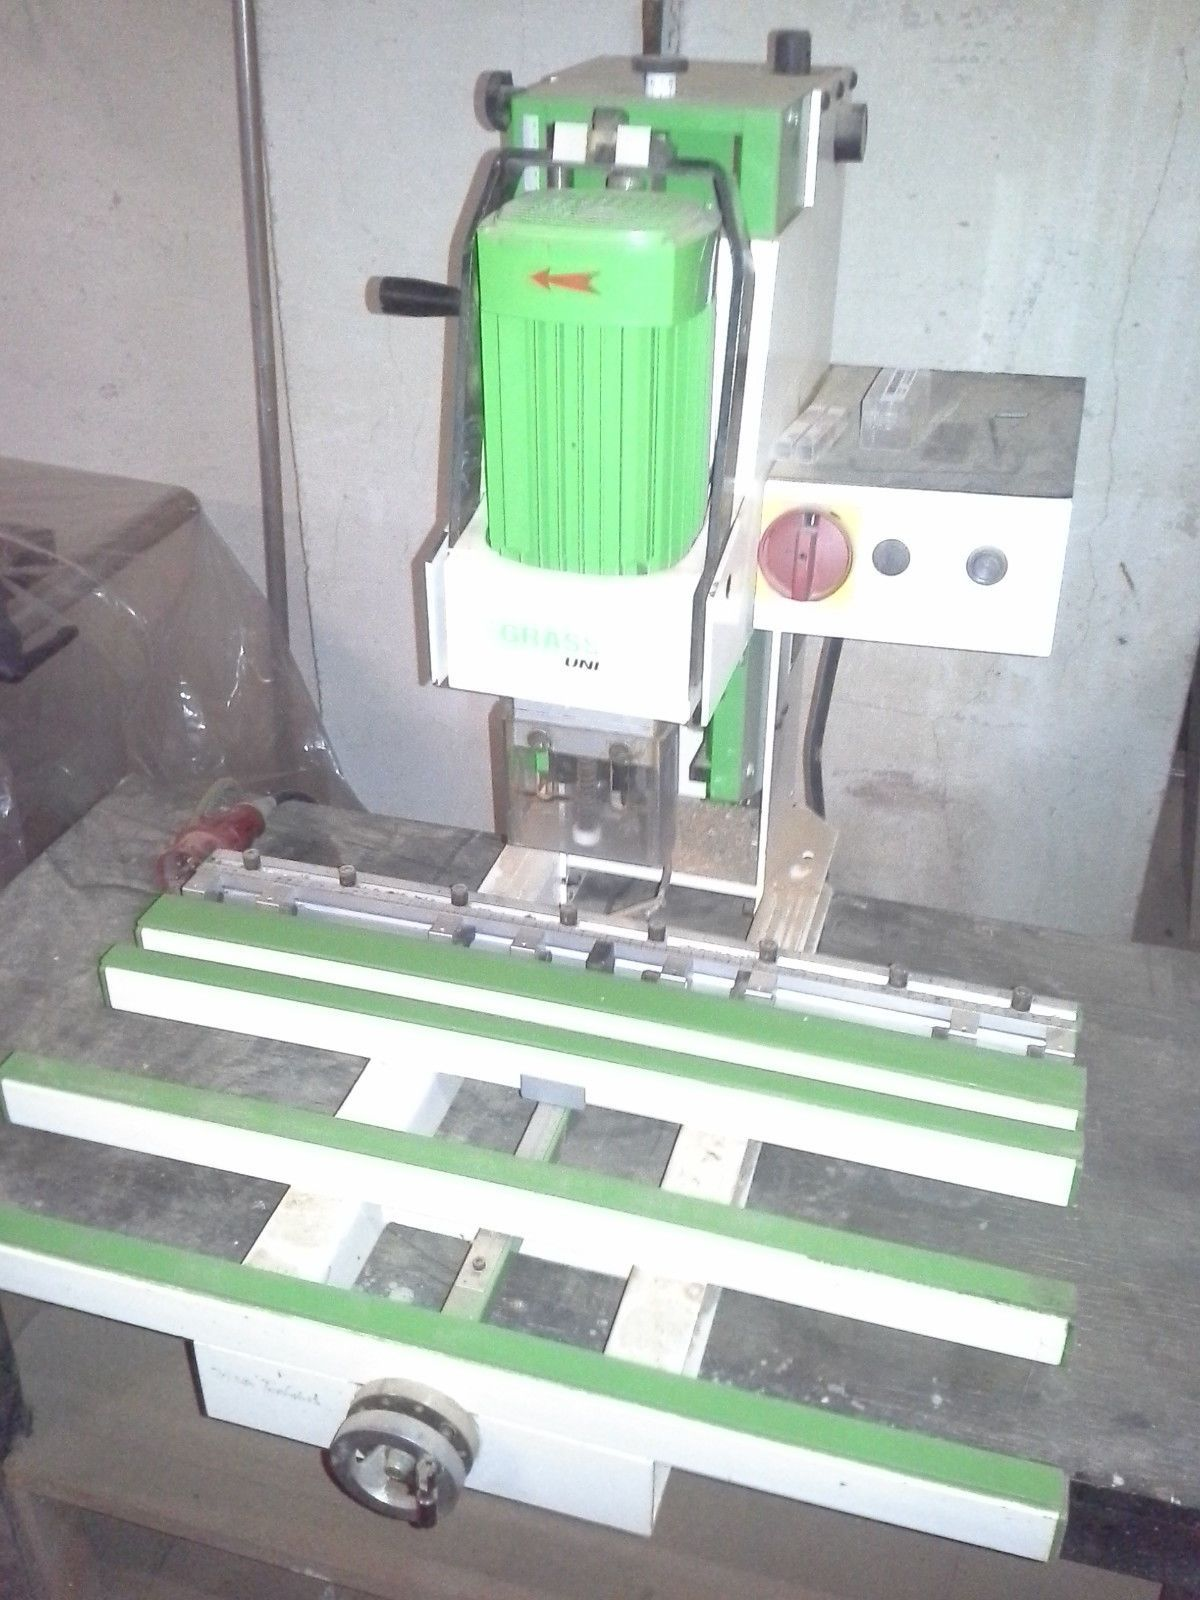 Beschlagbohrmaschine Grass UniPress, Topfbandbohrmaschine Lochreihenbohrmaschine